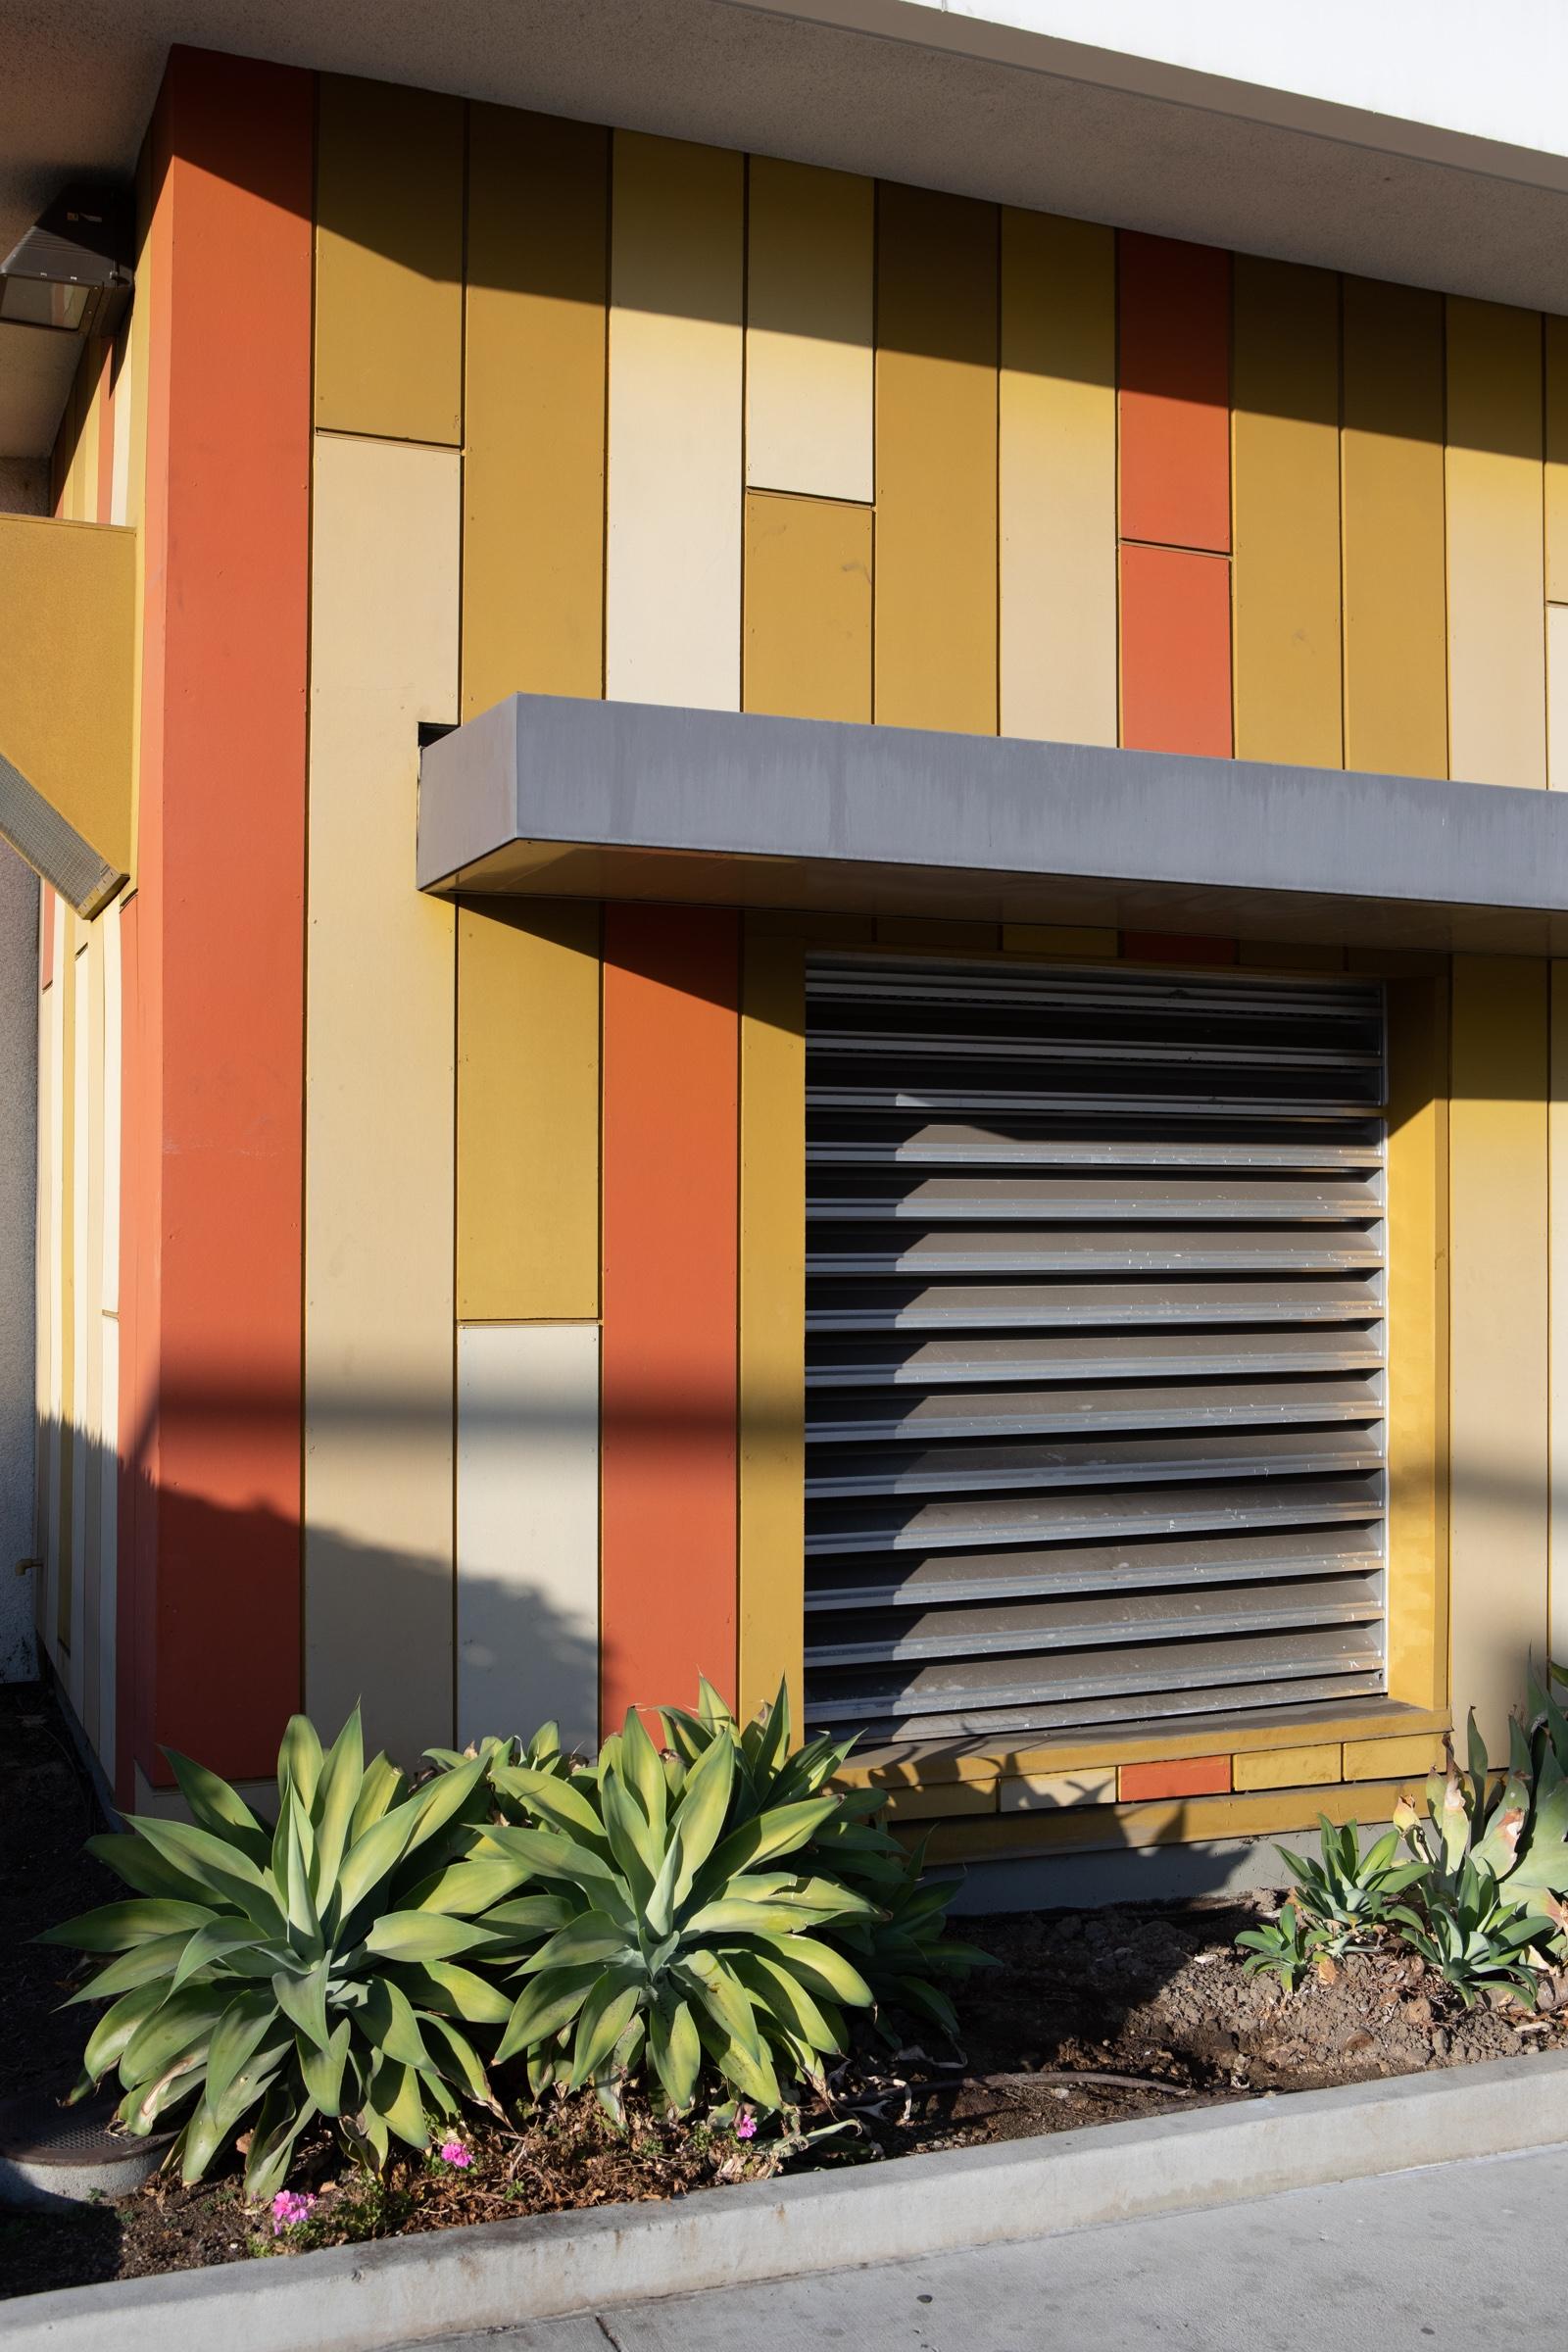 Vent, Apartment Building, Holly - odouglas | ello